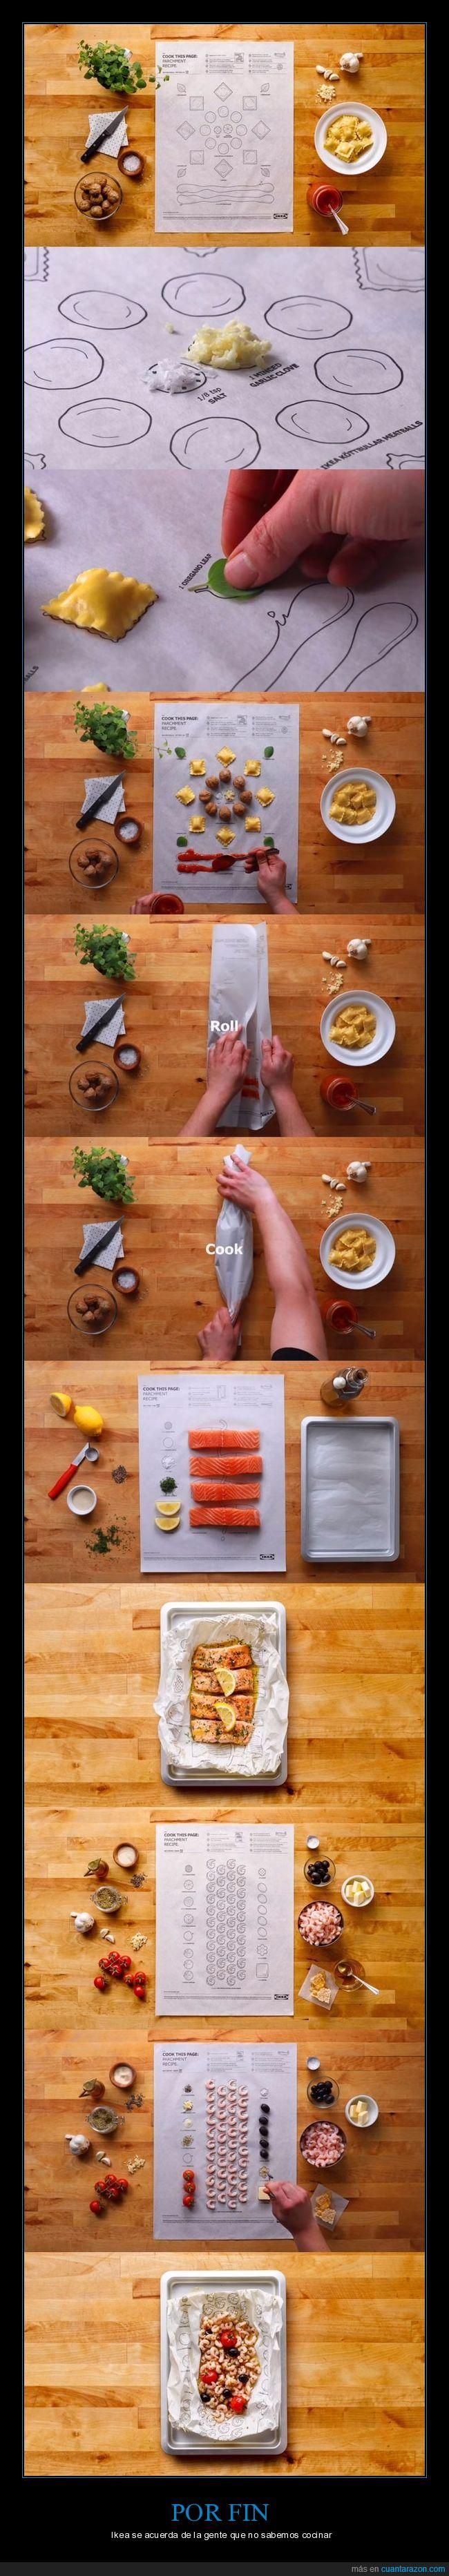 cocinar,ikea,recetas